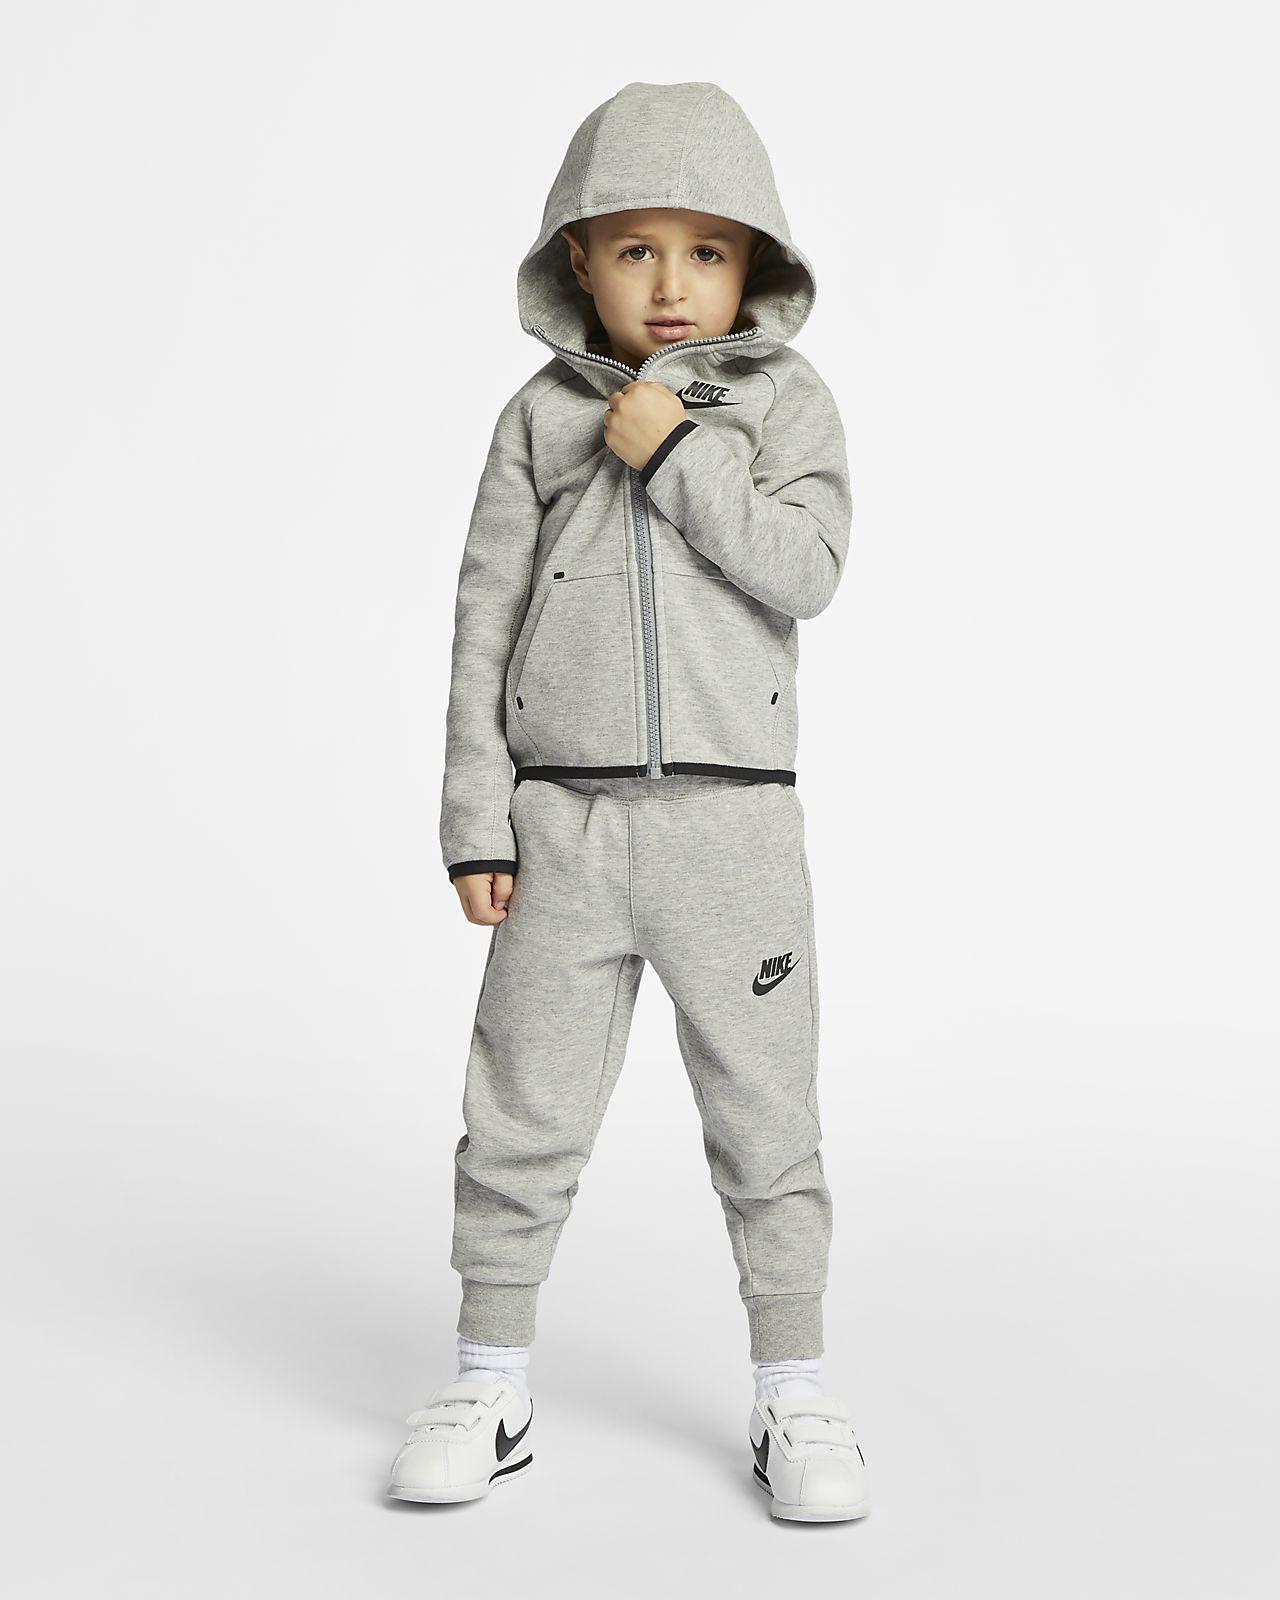 Nike Sportswear Tech Fleece Toddler Hoodie and Pants Set